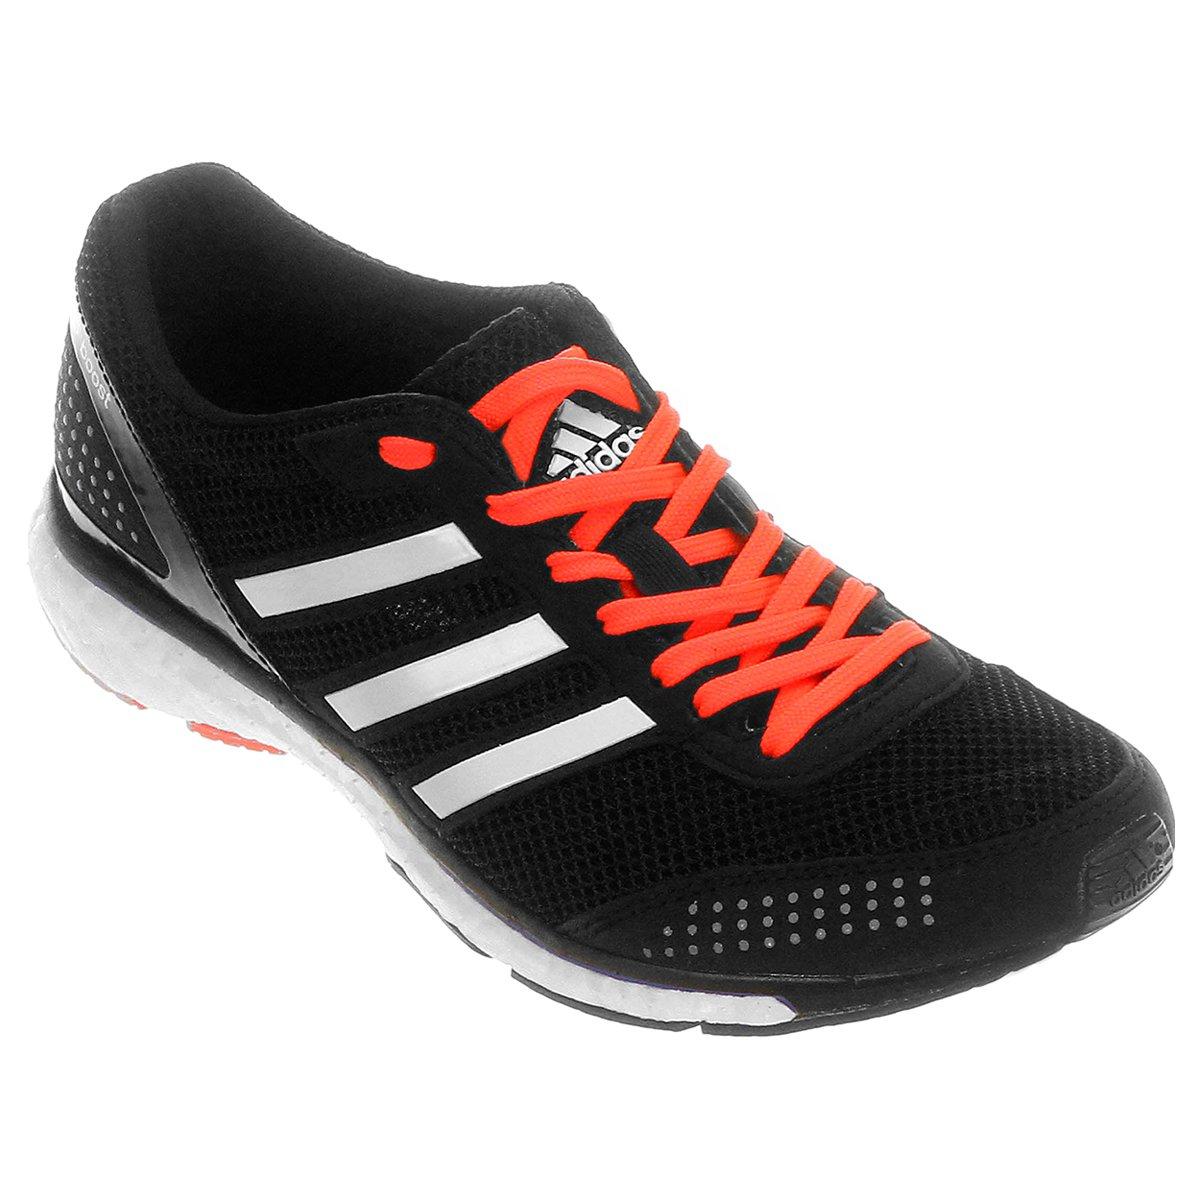 432eb14b73c1c Tênis Adidas Adizero Adios Boost 2 - Compre Agora